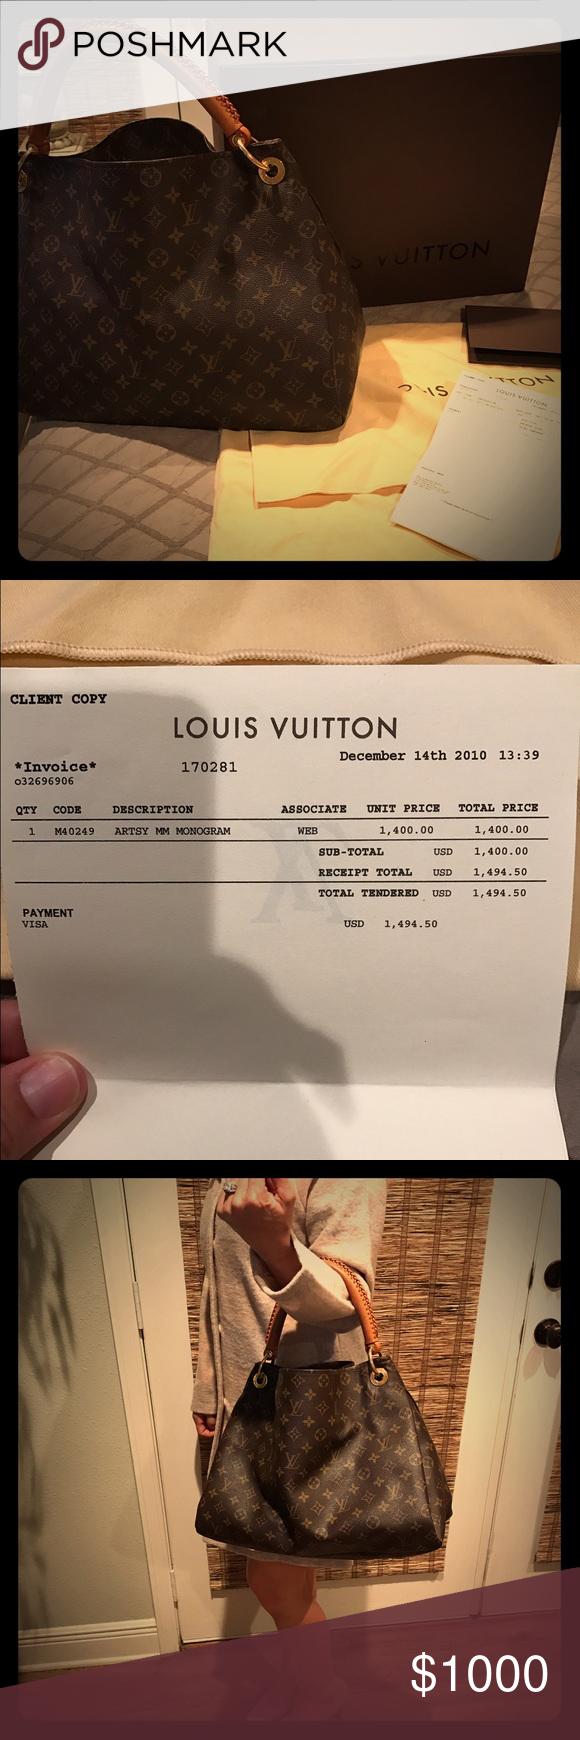 Spanish Rice Receipt Pdf Louis Vuitton Purse  Louis Vuitton Monograms And Shoulder Bags Receipt Com Word with What Is Receipts Excel Louis Vuitton Purse Toll By Plate Invoice Florida Pdf